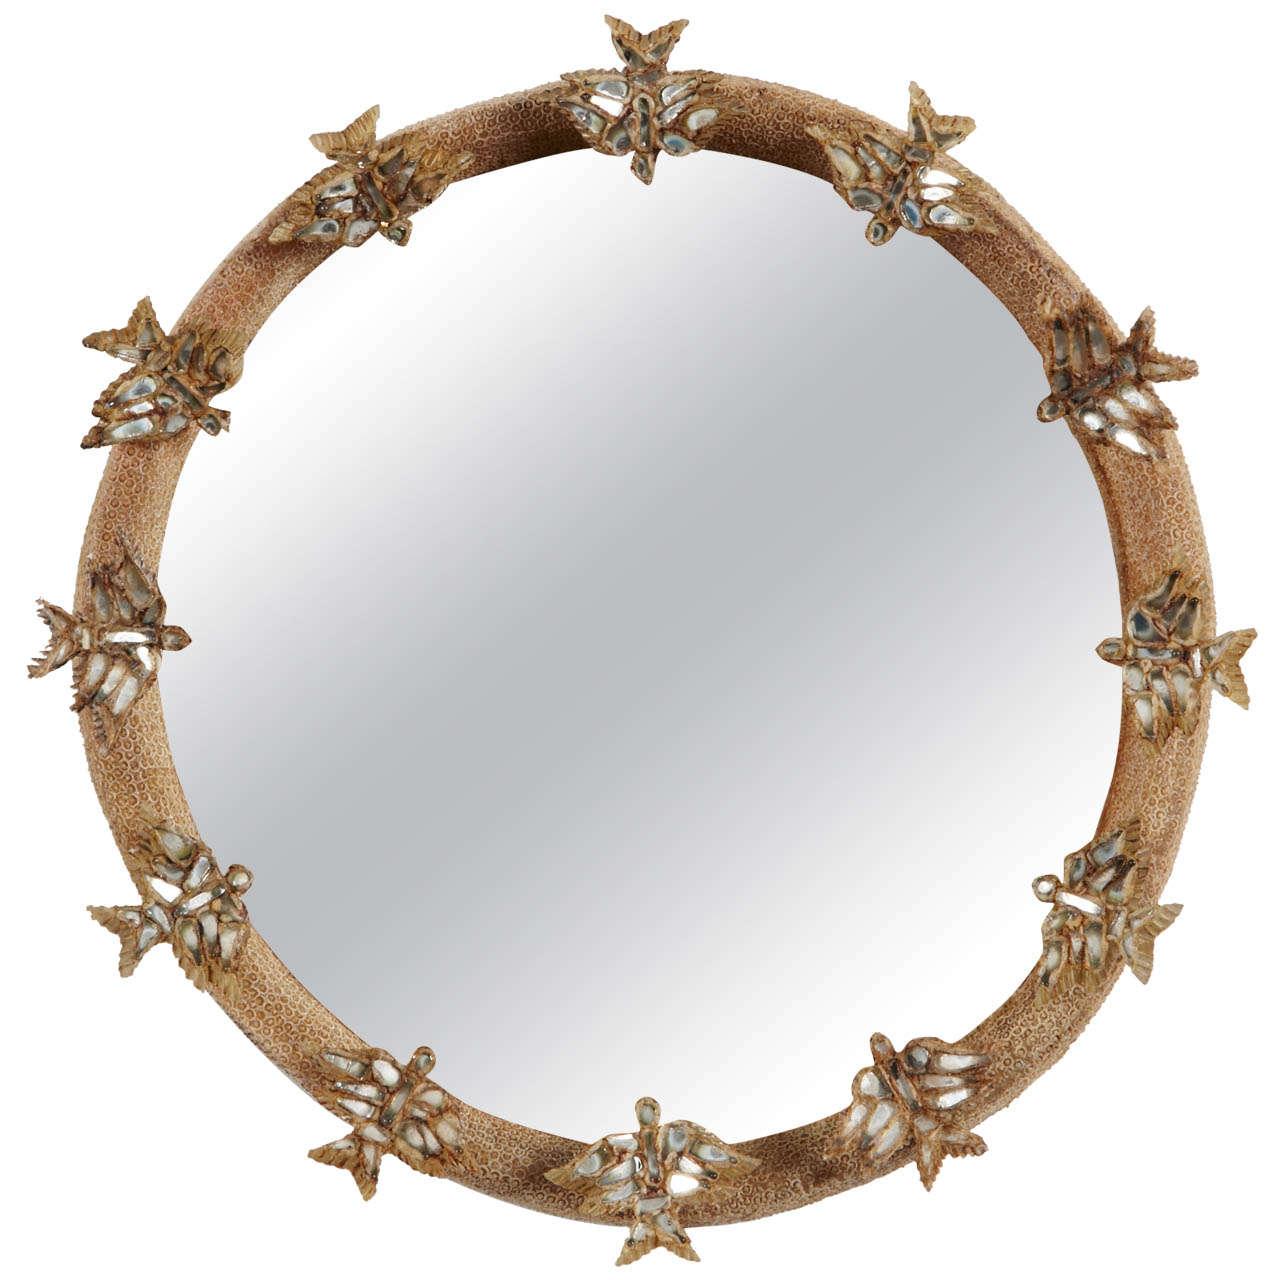 Line vautrin skylark mirror miroir aux alouettes at 1stdibs for Miroir sorciere line vautrin